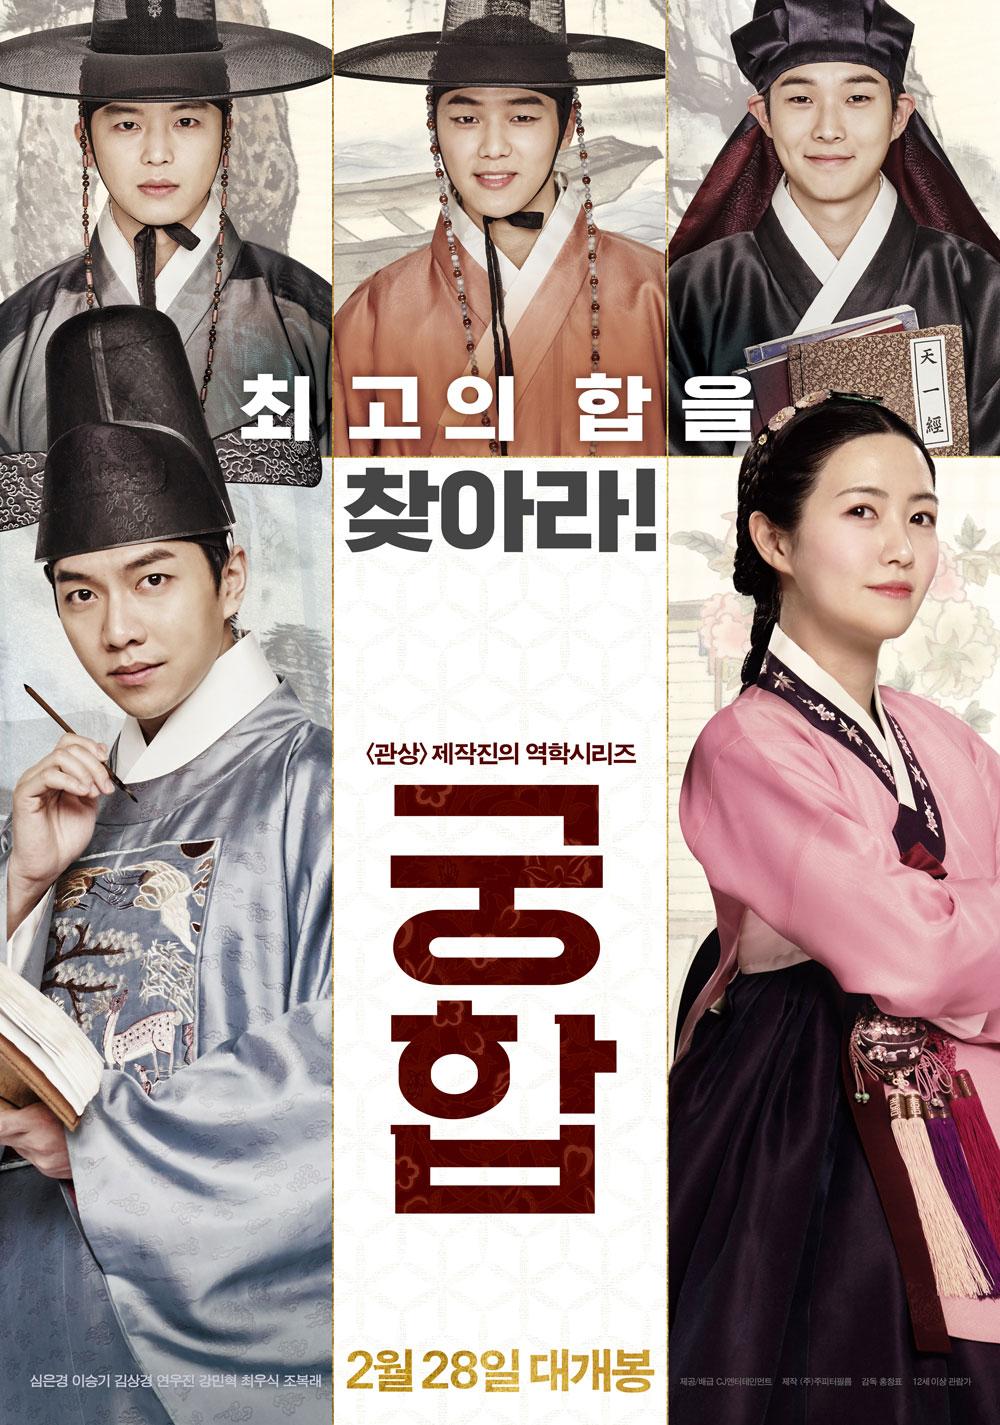 [FILM] Minho: 궁합 / The Princess and the Matchmaker